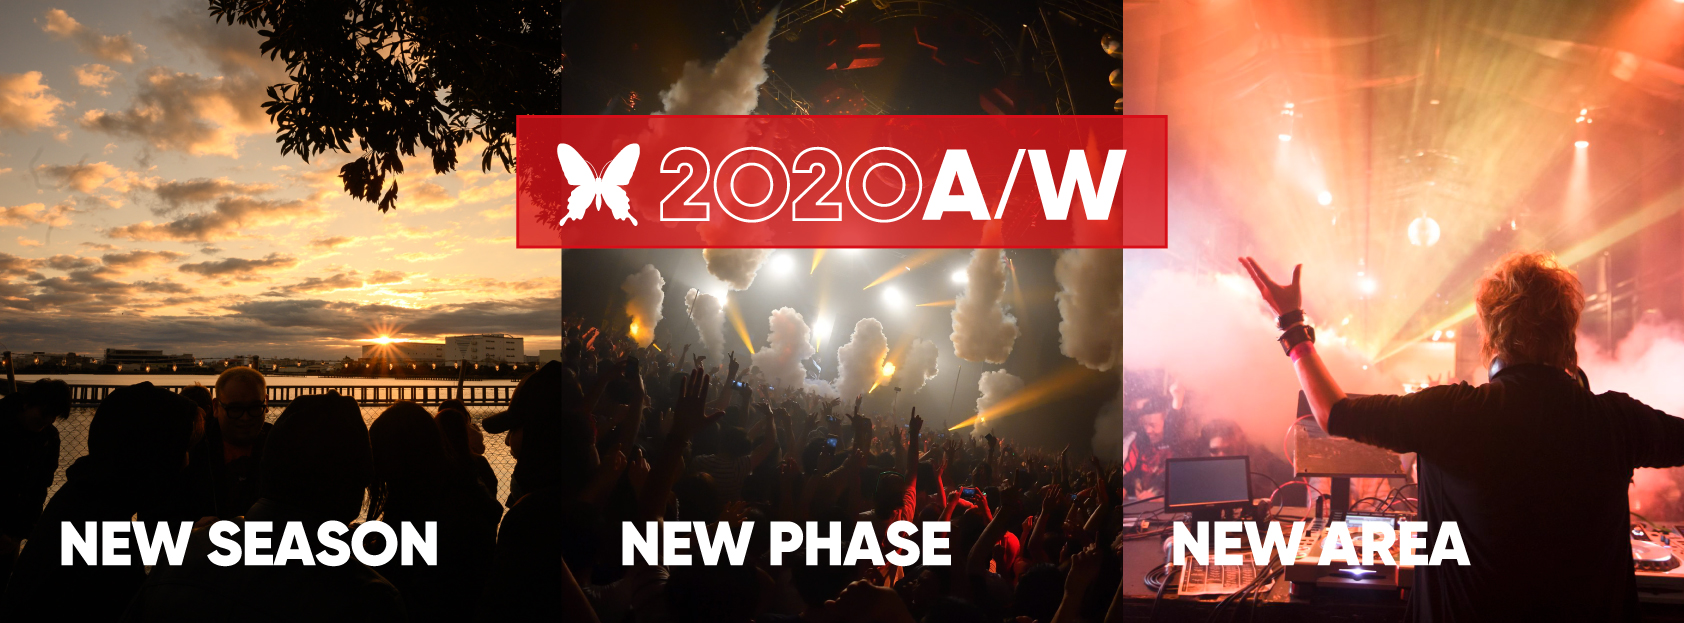 ageHa 2020 A/W「Diversity =多様性」「ARENA」を正式に再オープン!さらに屋外に新エリア「TENT」誕生!